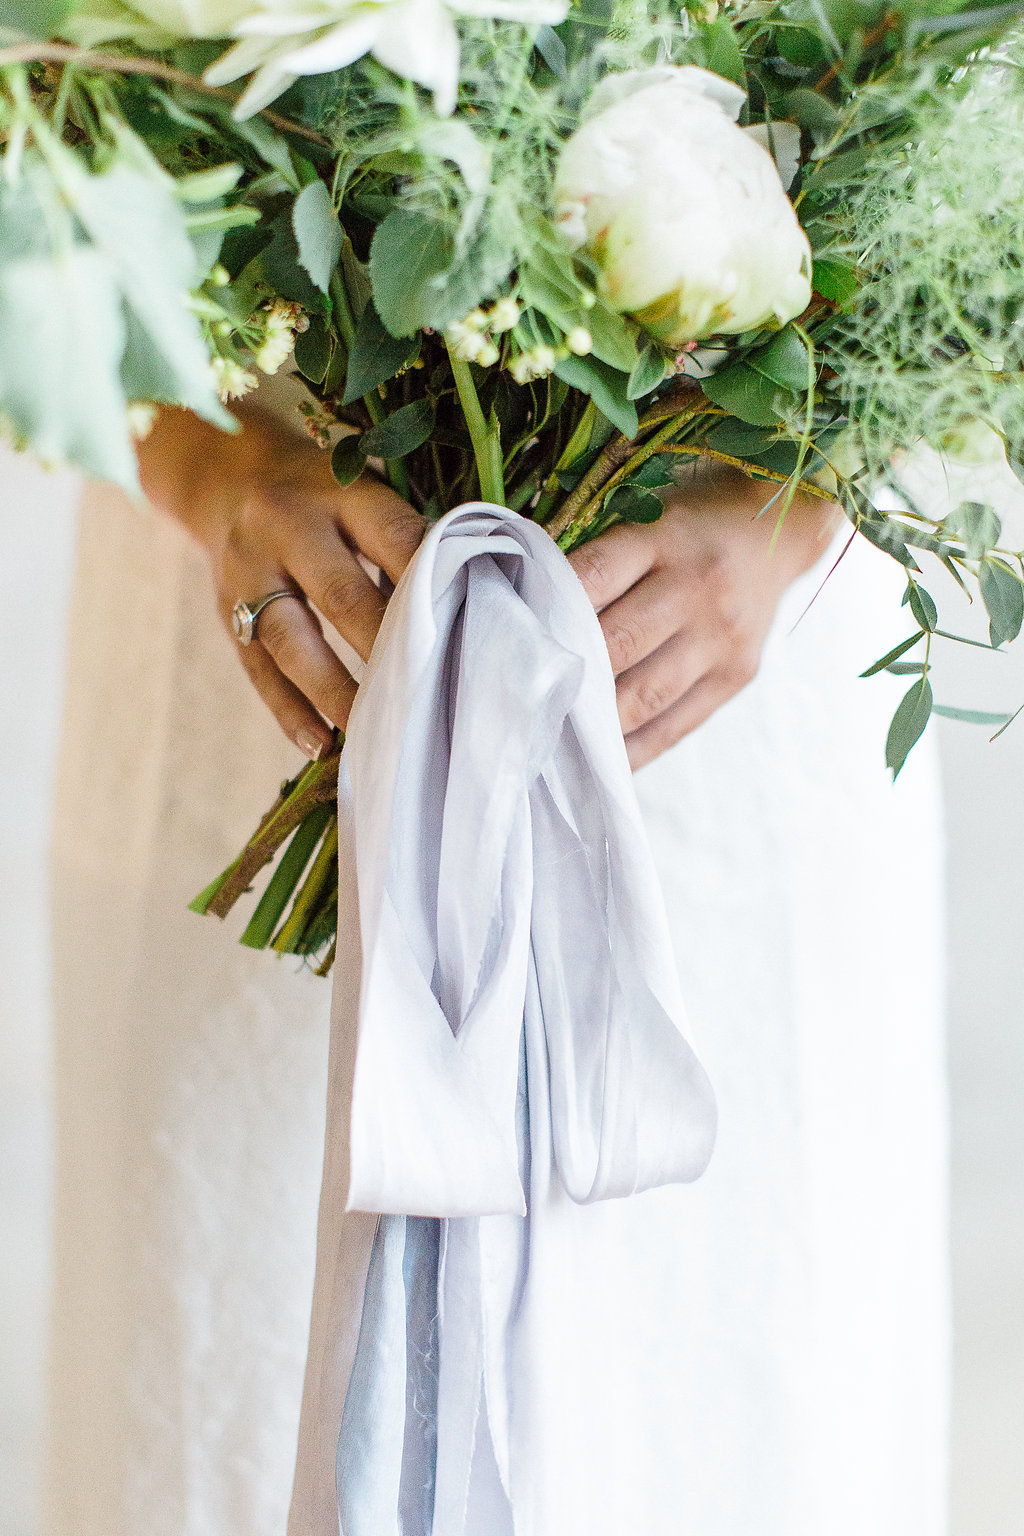 Verona-Destination-Wedding-Inspiration-by-Kibogo-Photography15.jpg